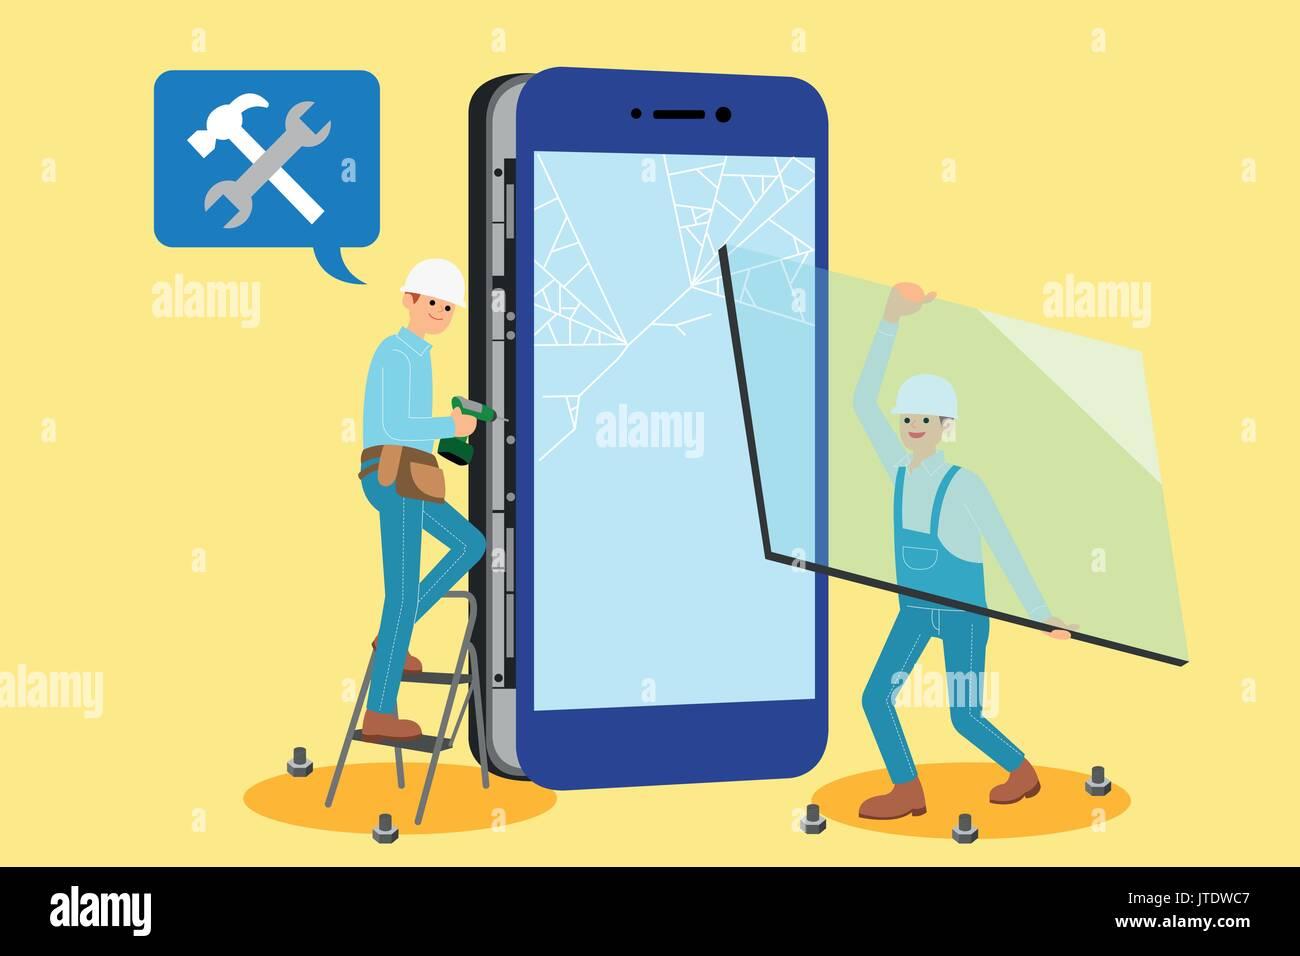 Mobile world - Stock Image